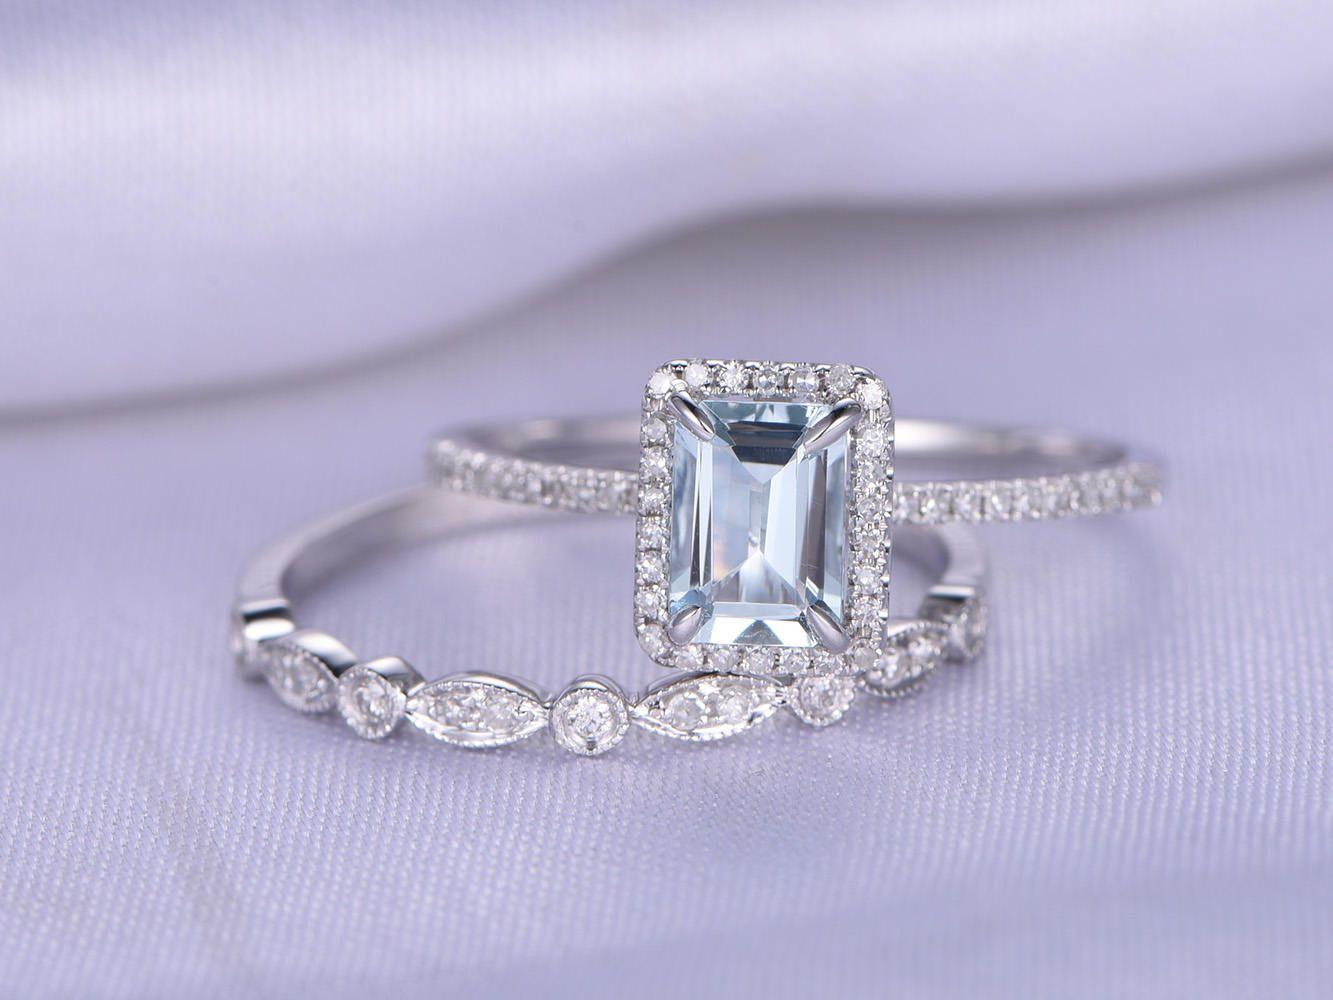 Bridal Ring Set Aquamarine Engagement Ring 5x7mm Emerald Cut Natural Gemstone 14k White Gold Art Deco Diamond Wedding Band Customized #aquamarineengagementring